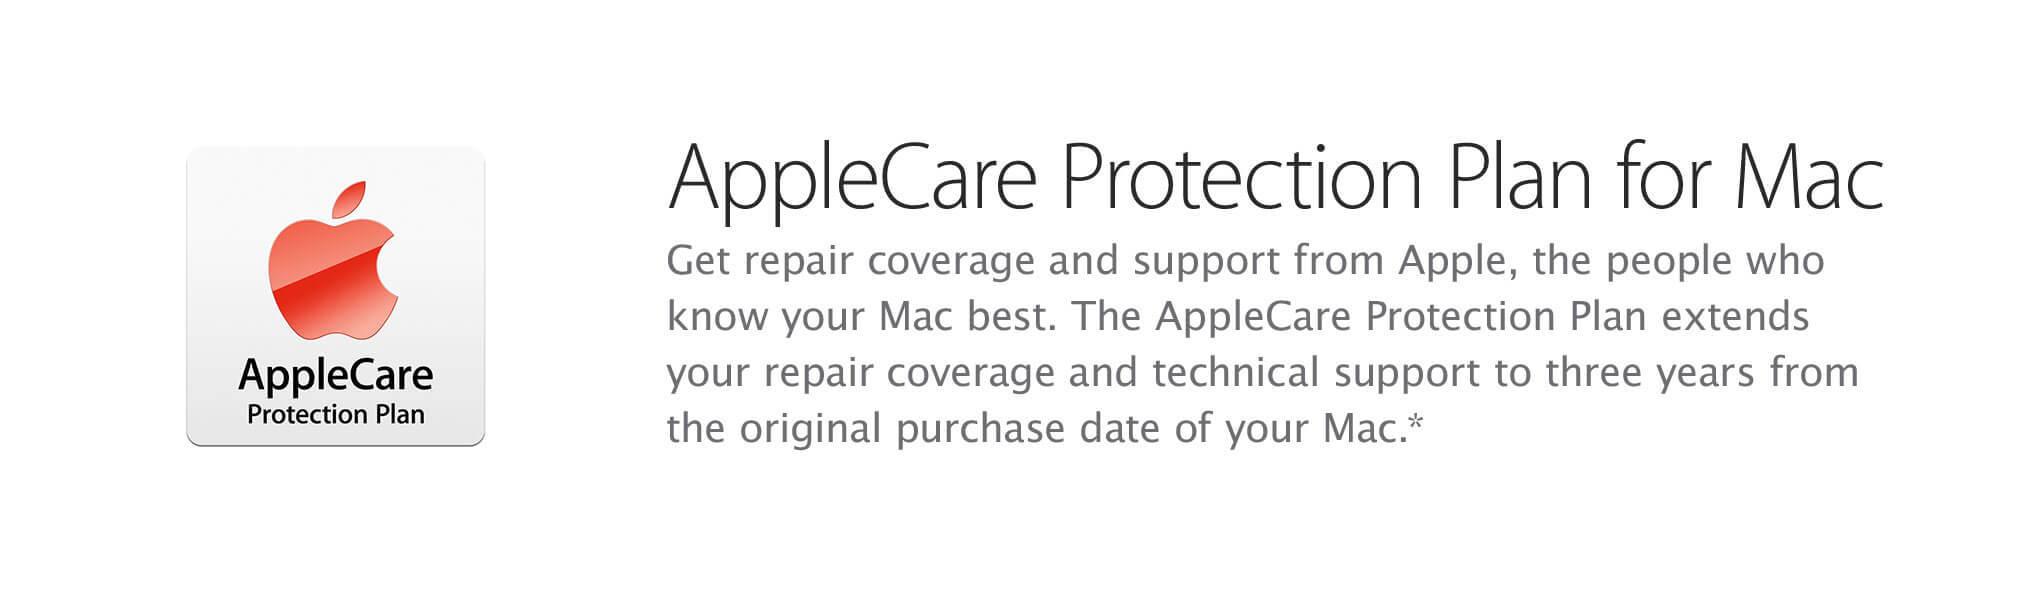 iMac 8